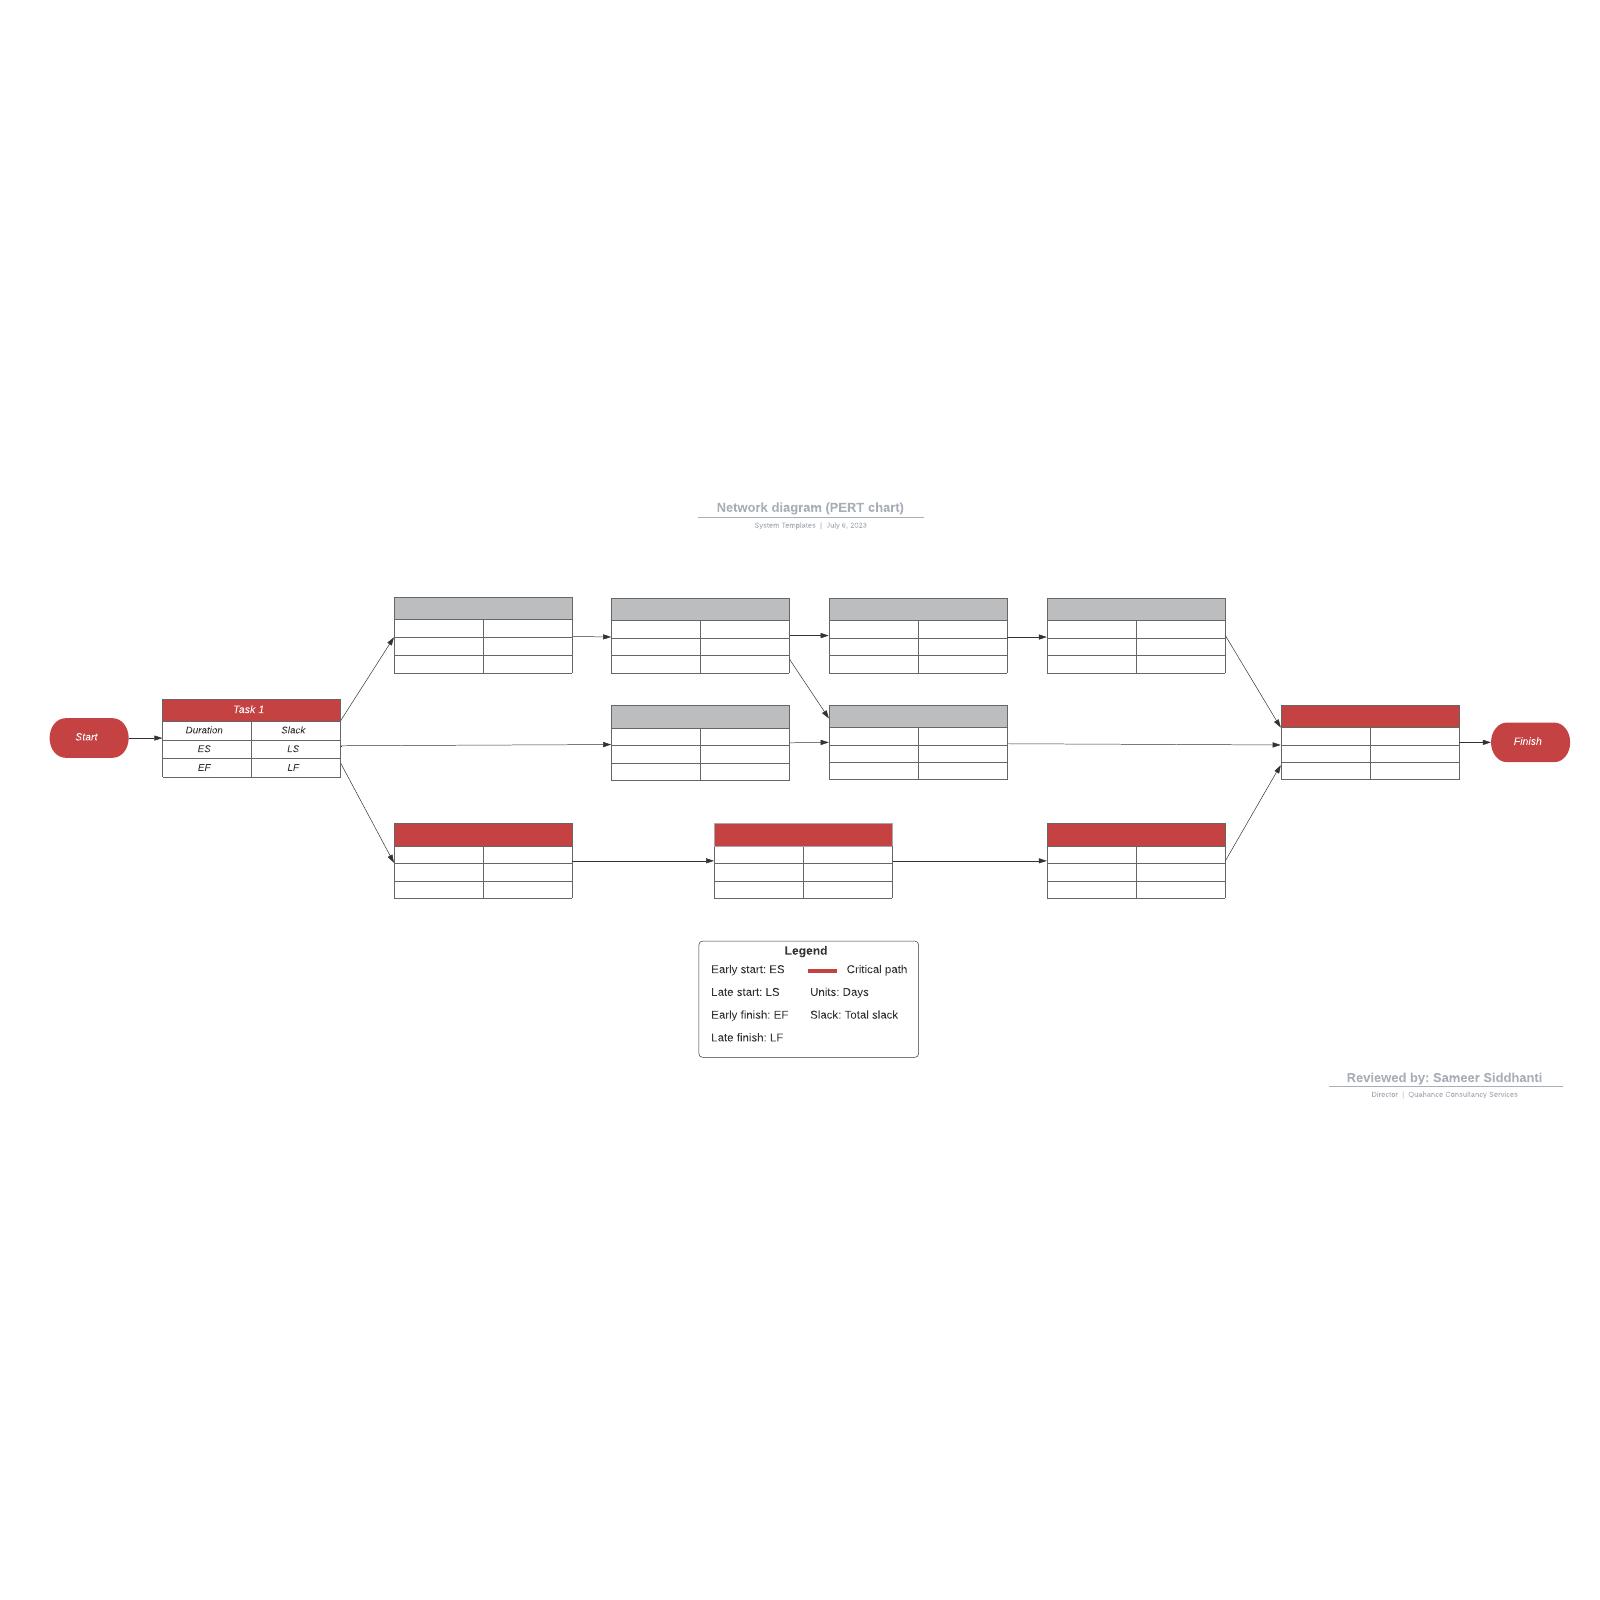 Network diagram (PERT chart)